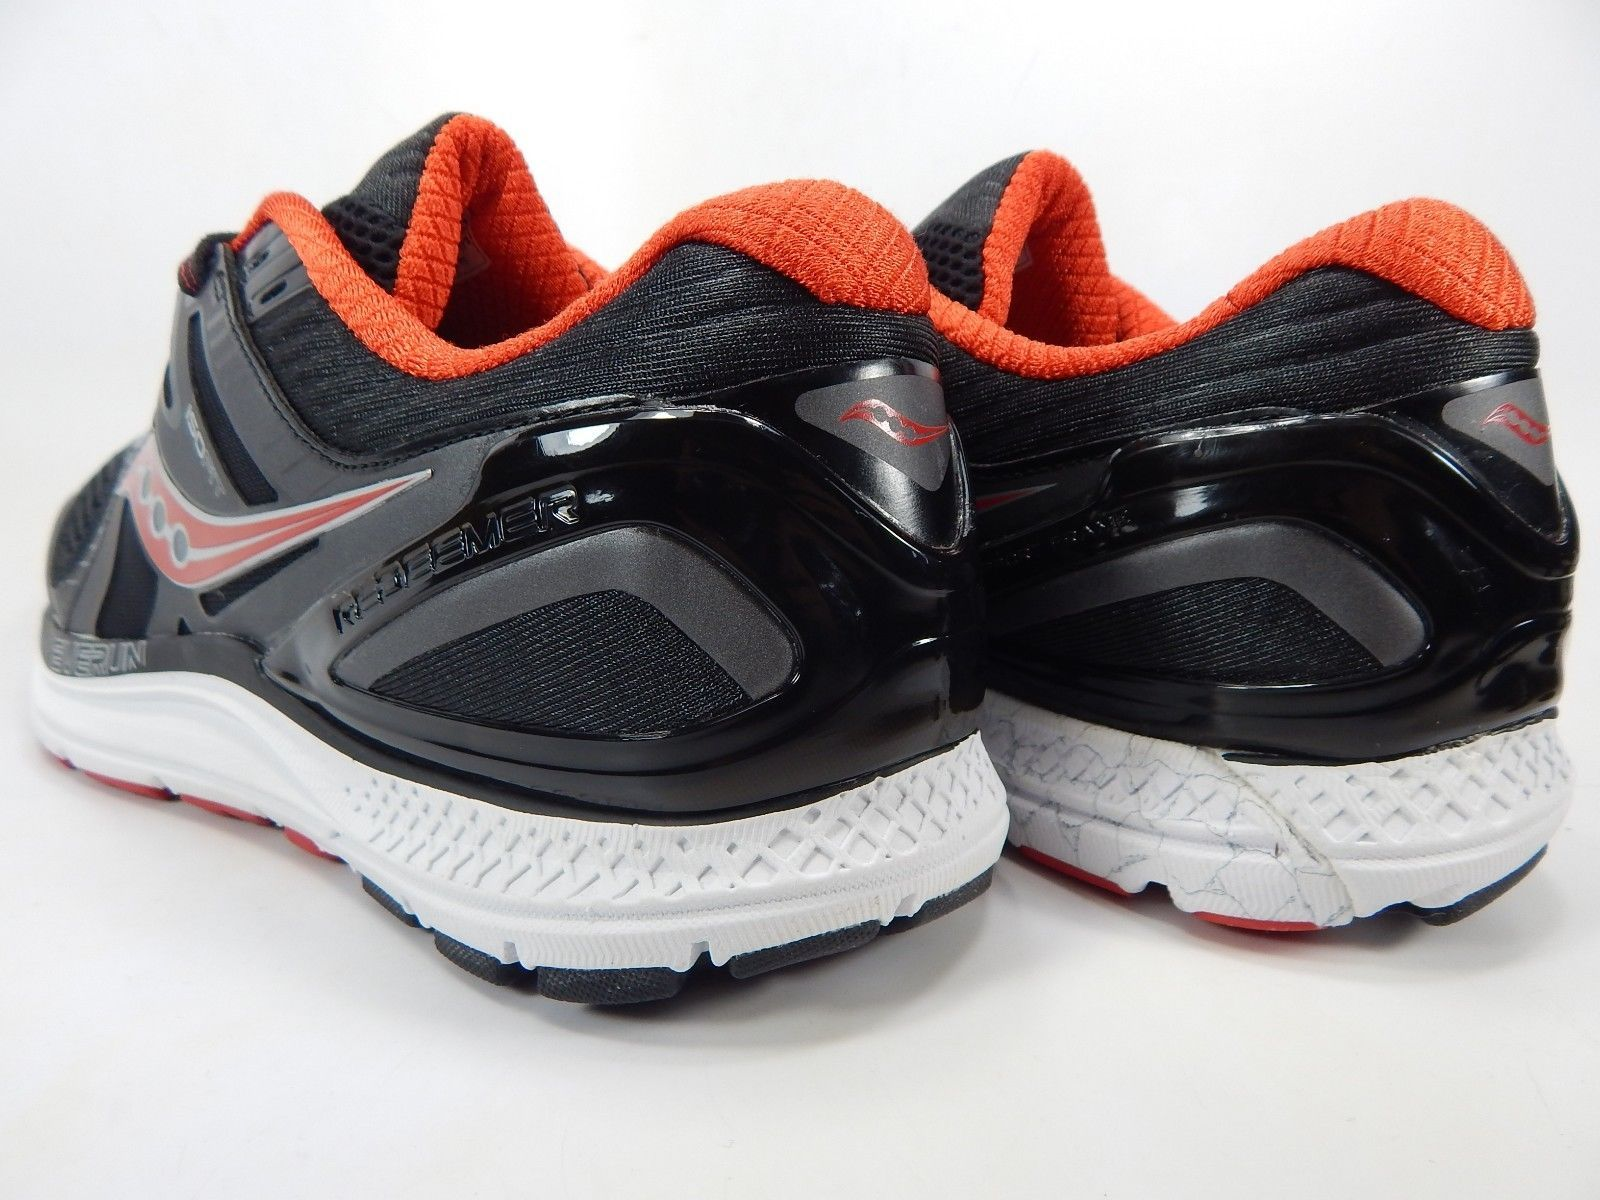 Saucony Redeemer ISO 2 Size 9 M (D) EU 42.5 Men's Running Shoes Black S20381-1